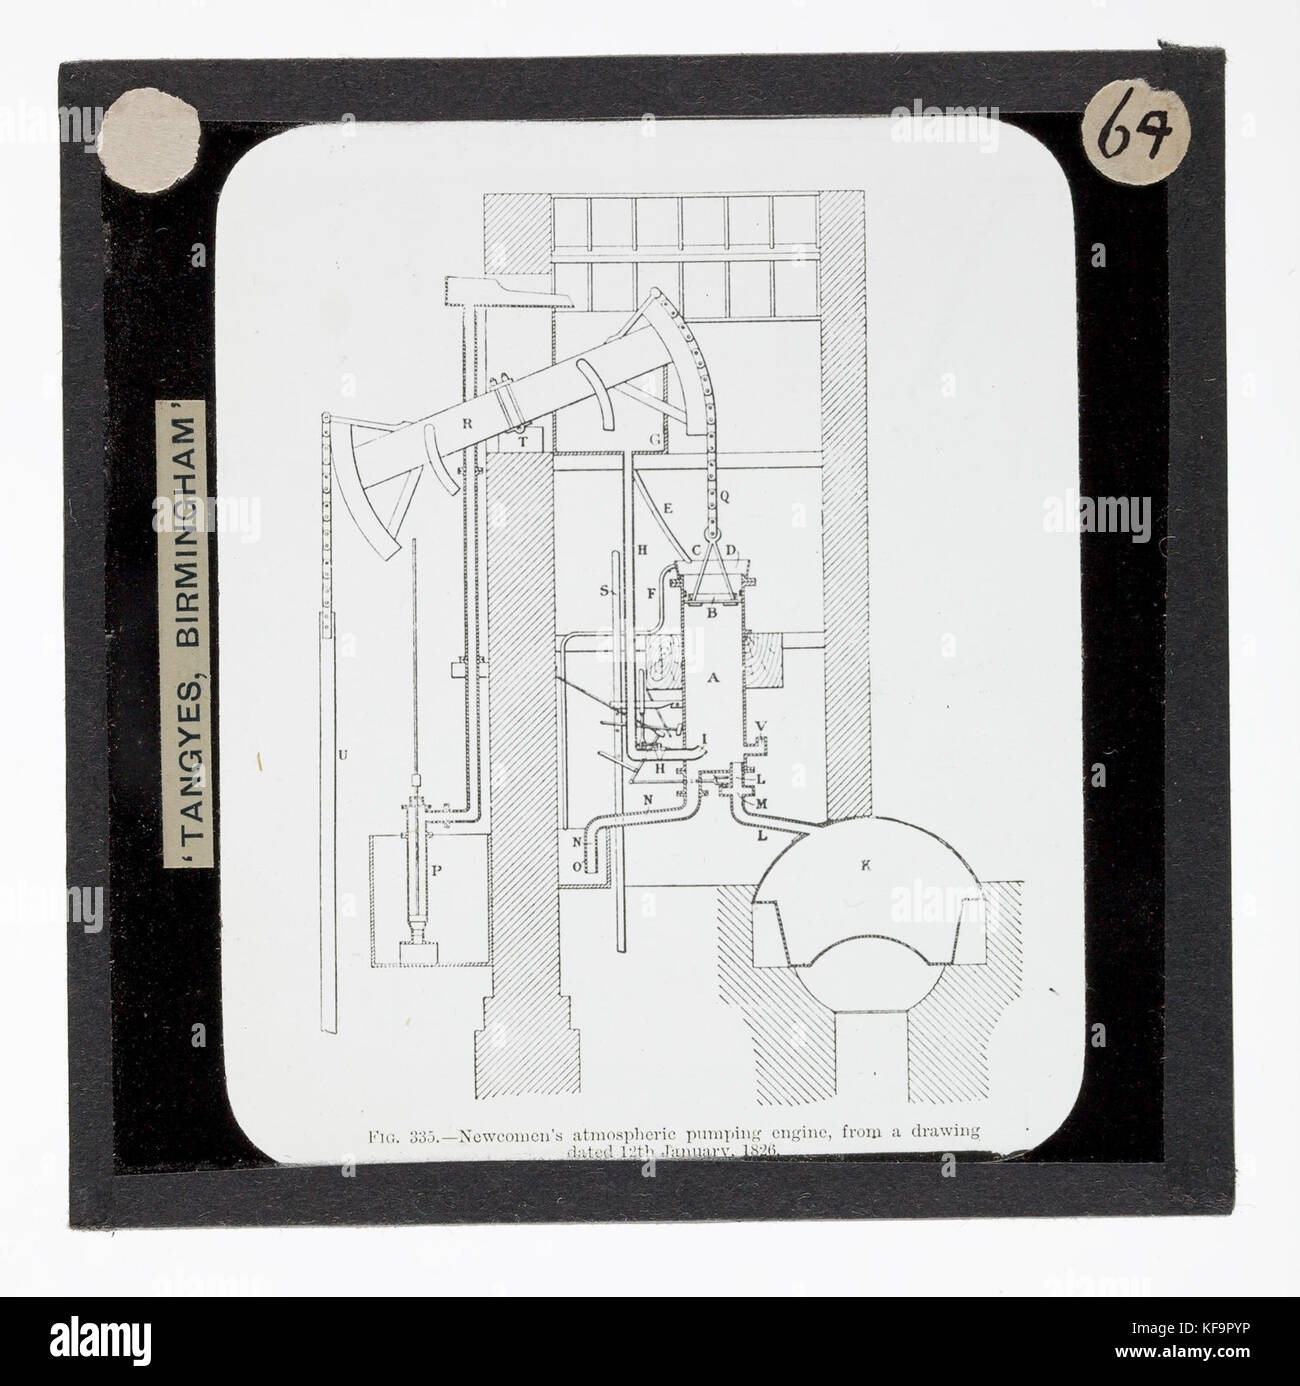 james watt steam engine diagram pourbaix nickel richard trevithick